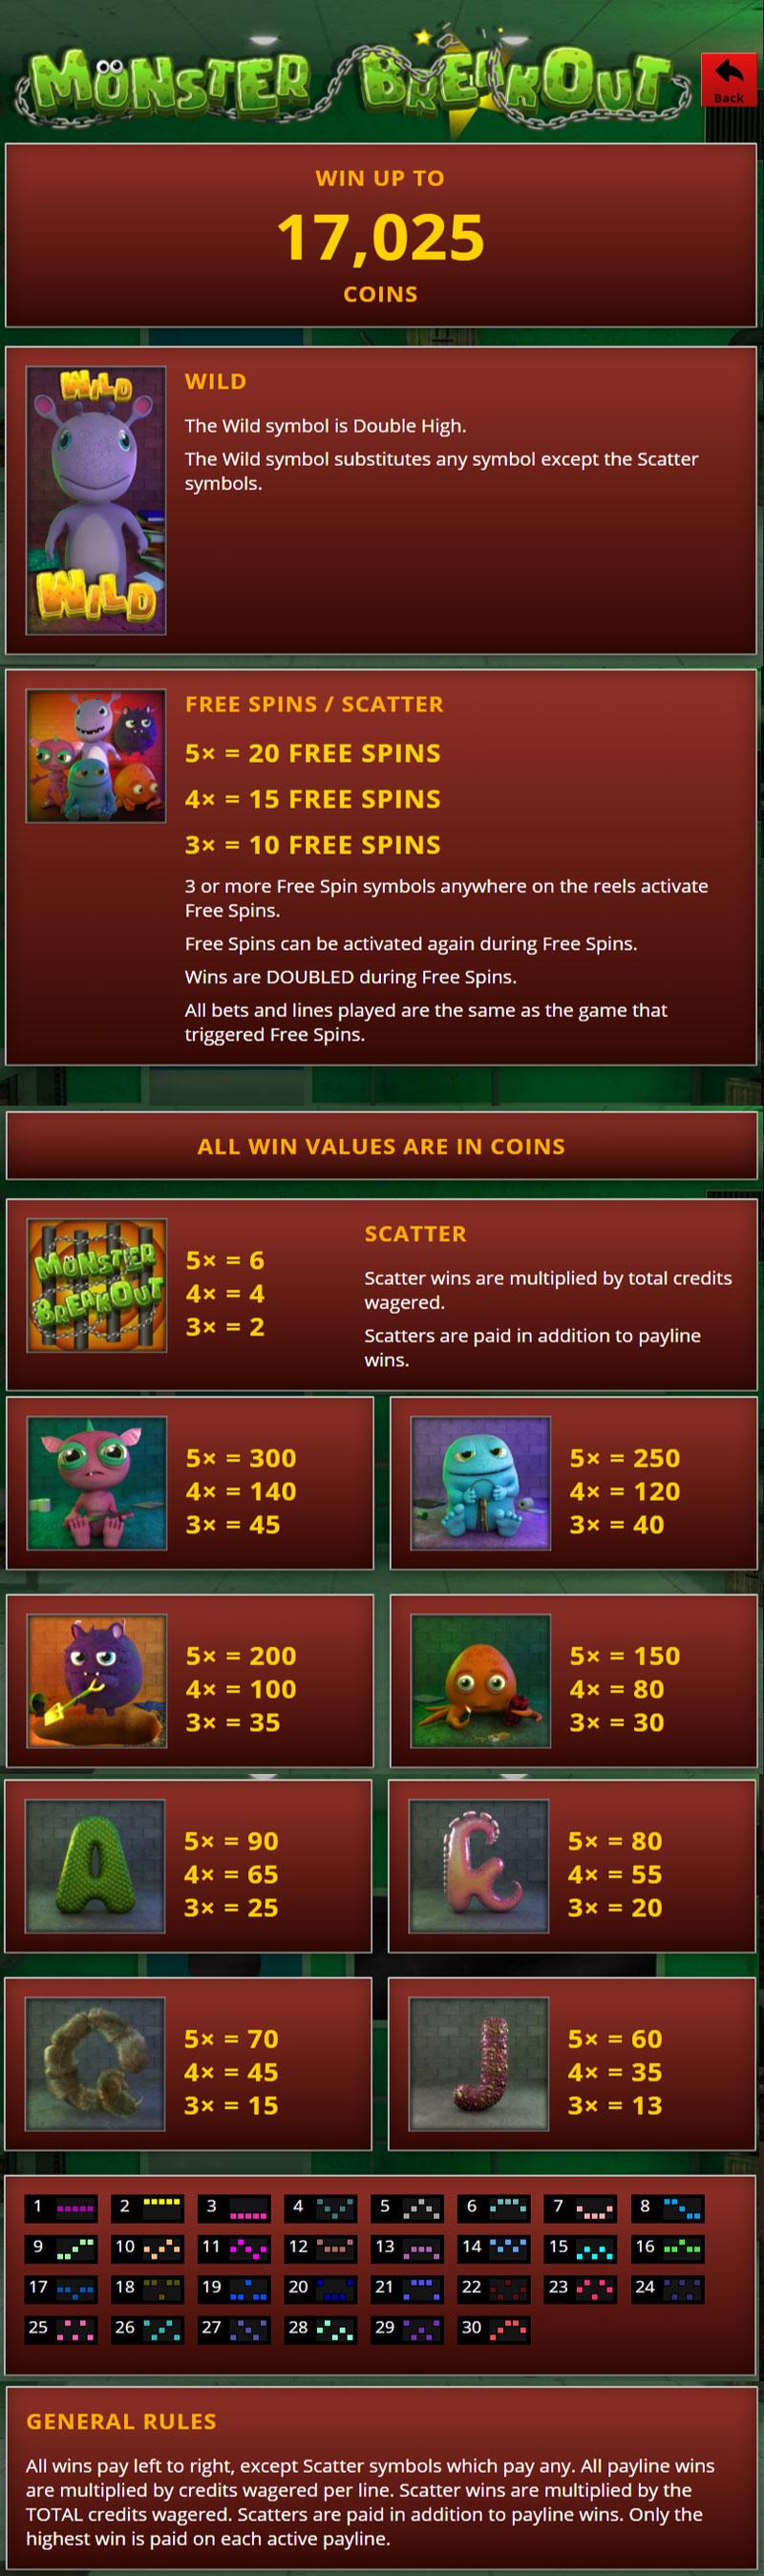 Monster Breakout Pay Table Screenshot, Mandarin Palace